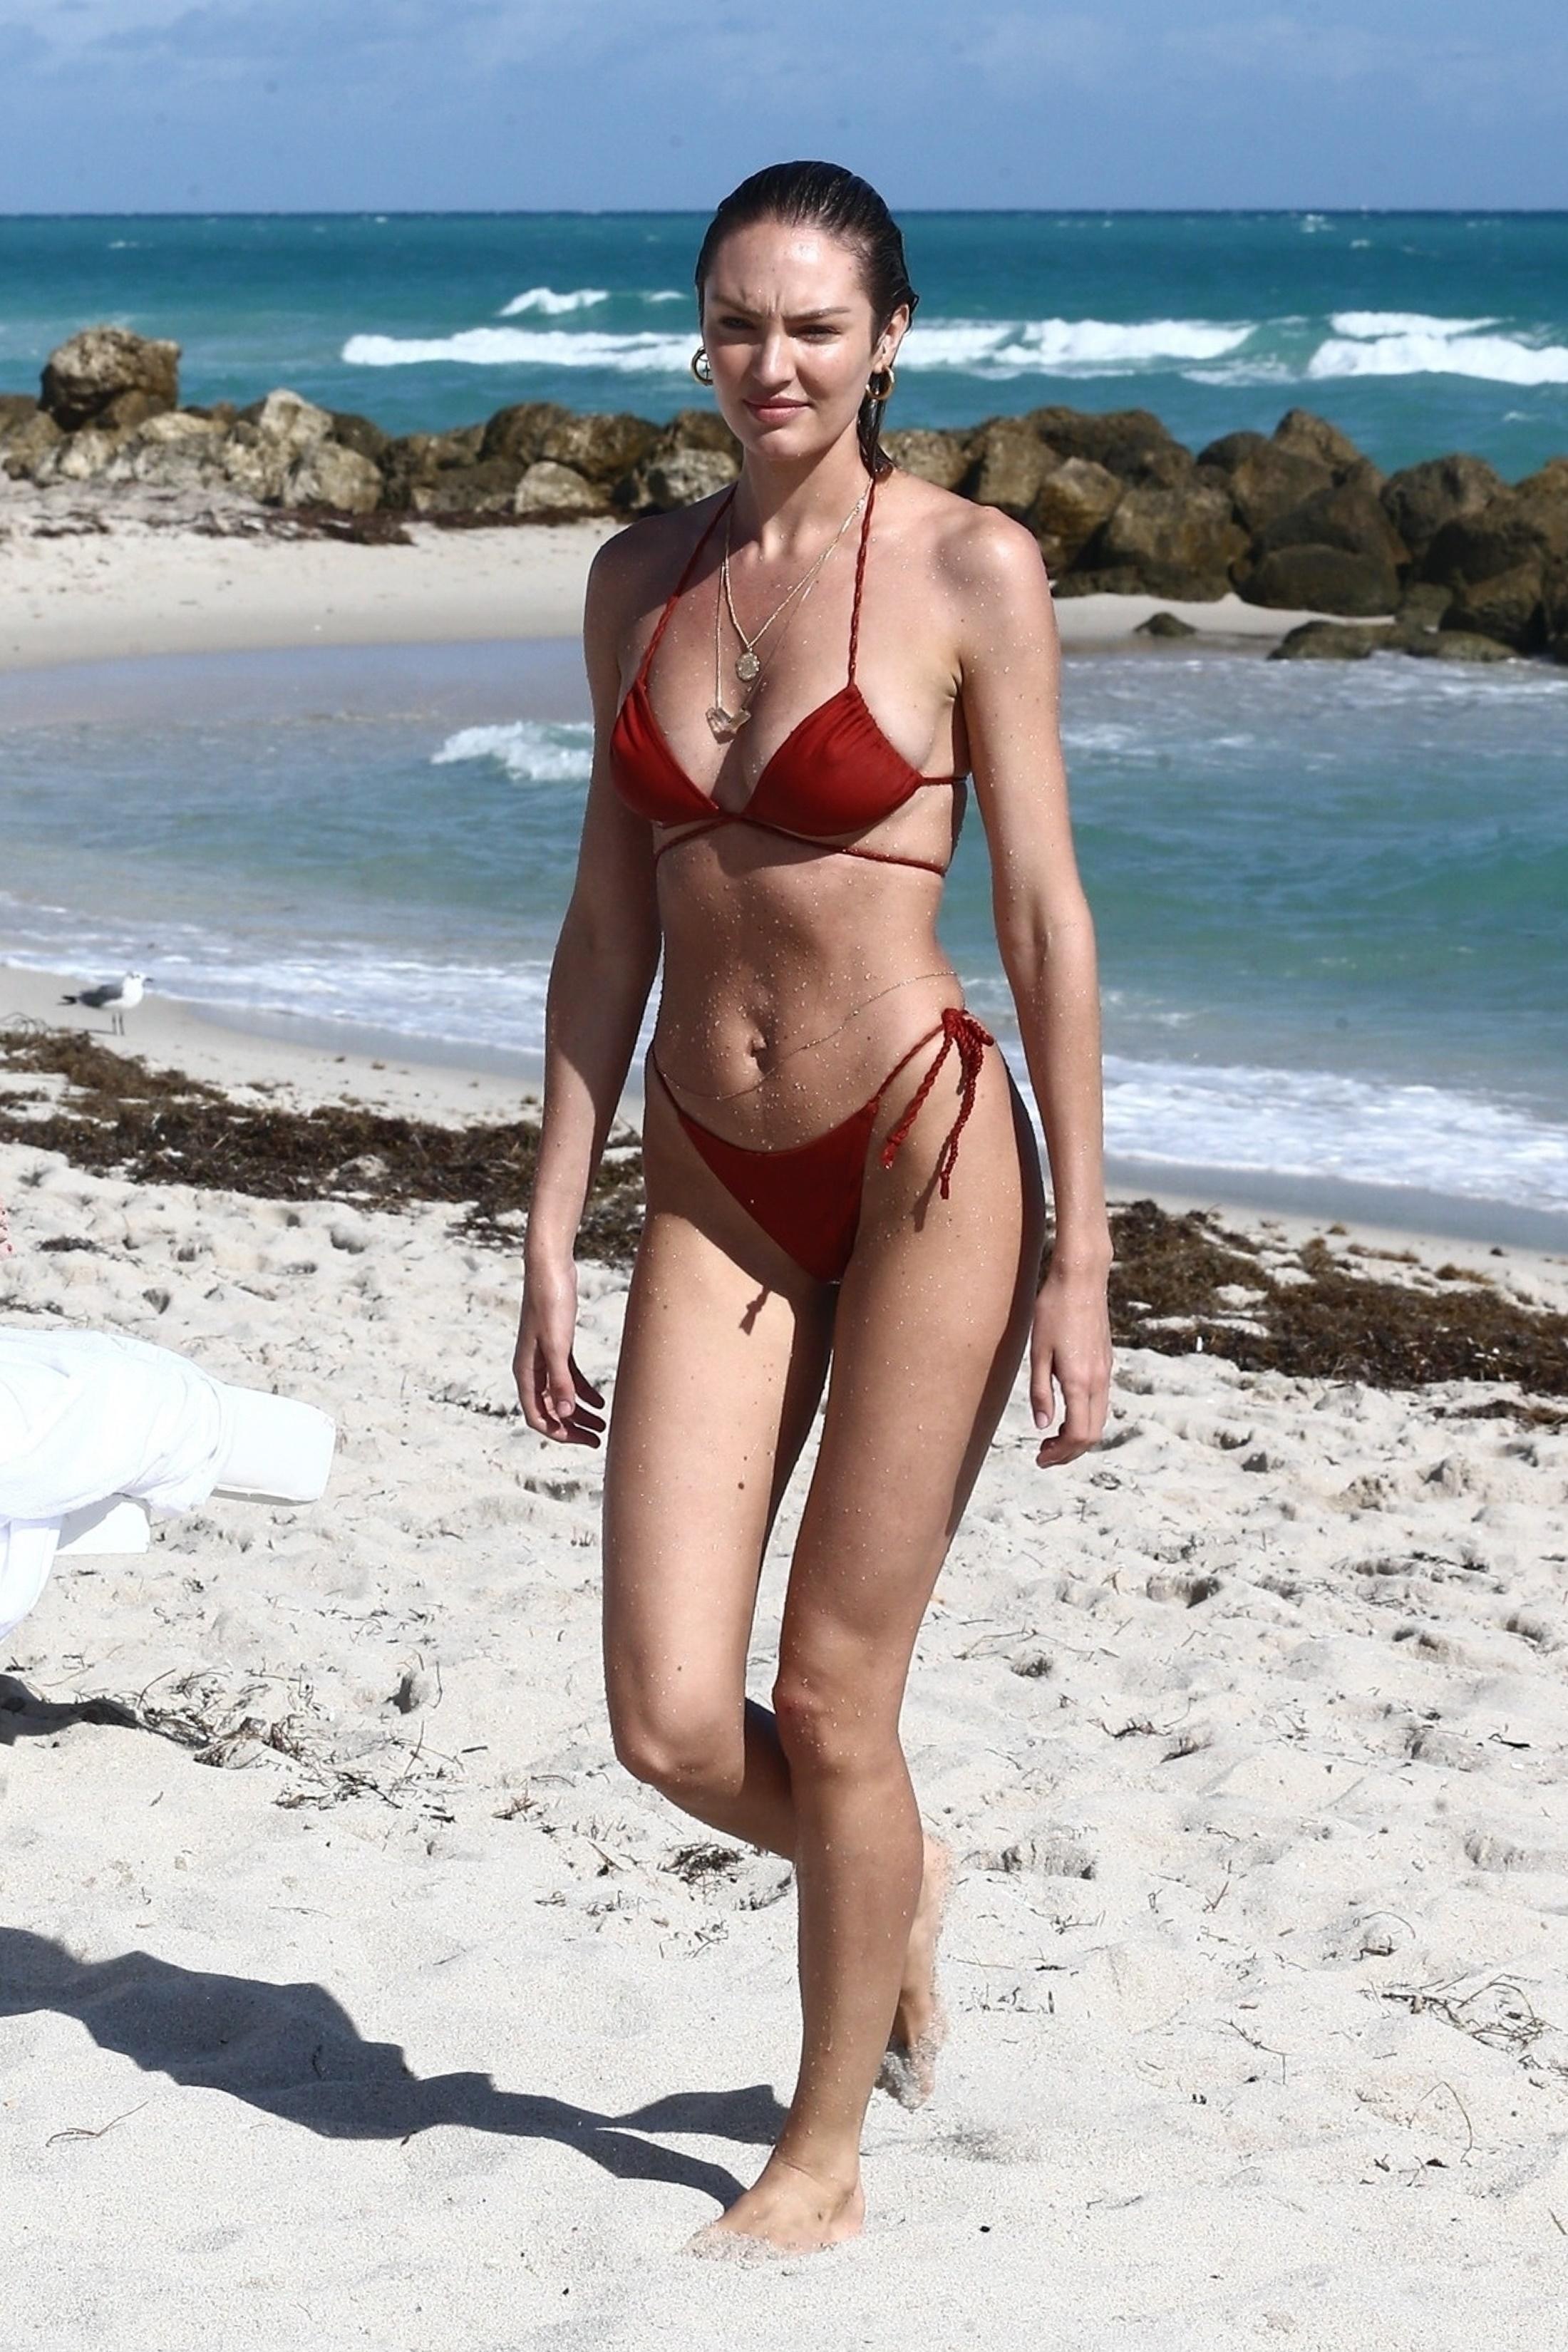 Sexy cougar models nude